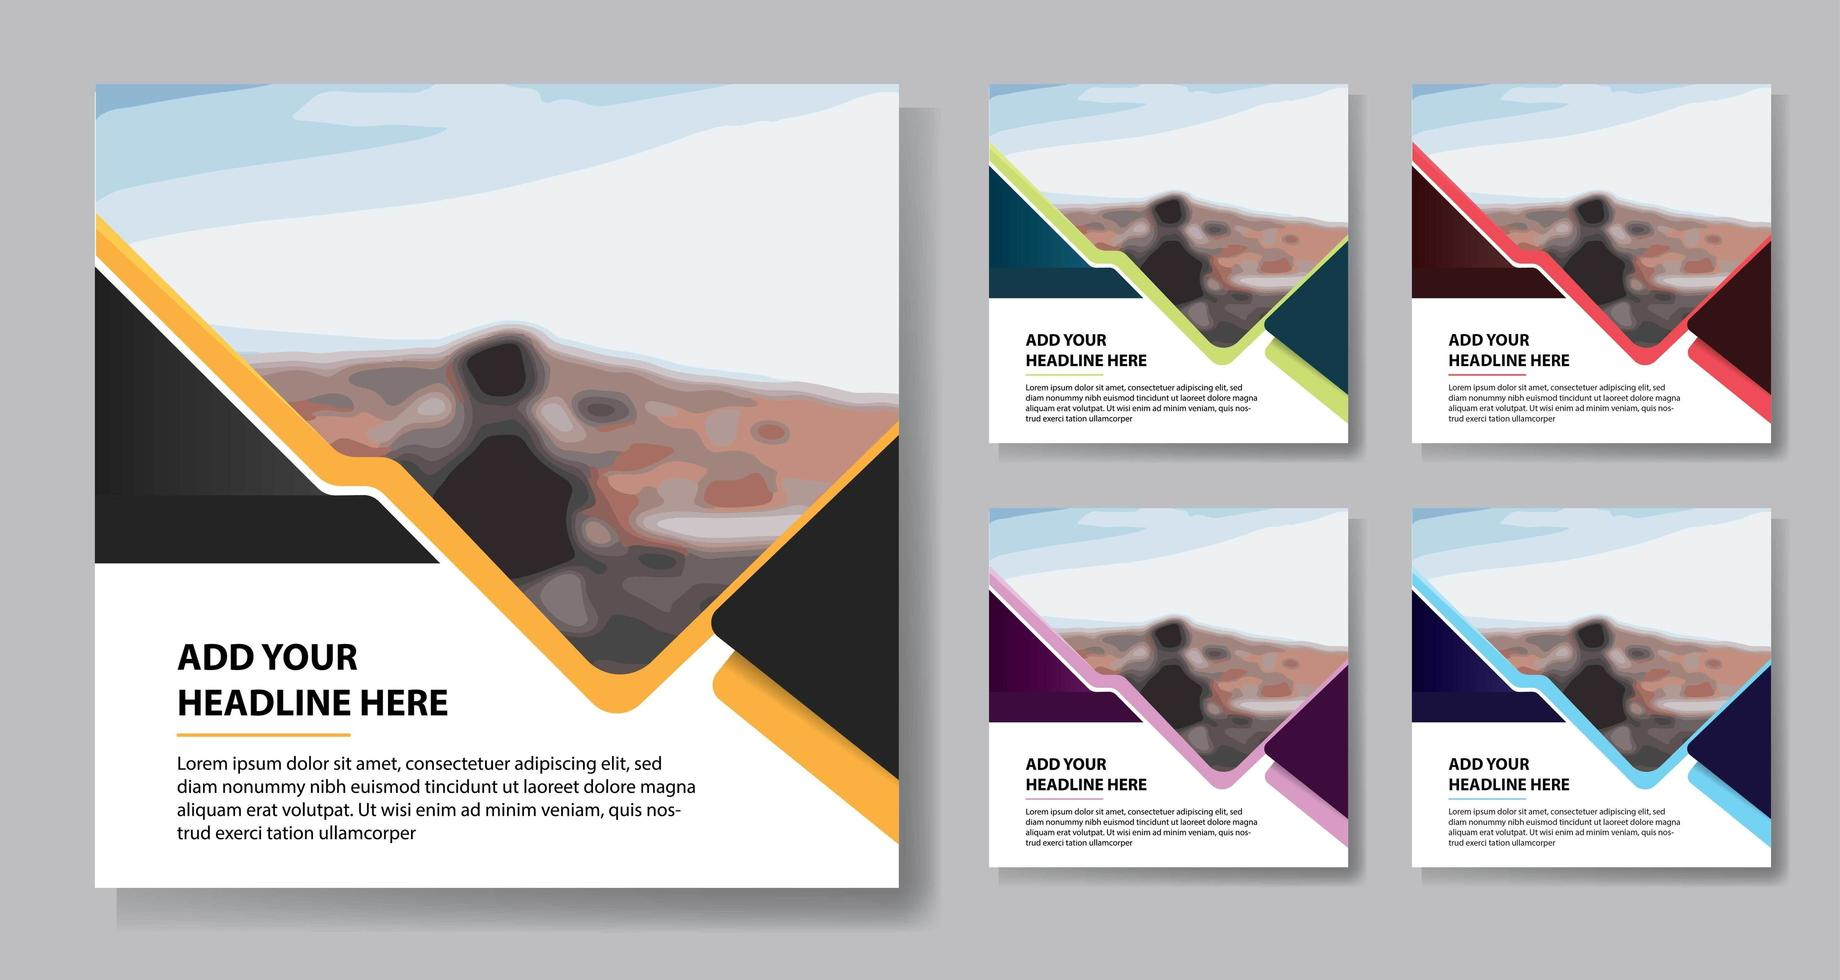 modelos de mídia ocial de destaque de triângulo colorido vetor